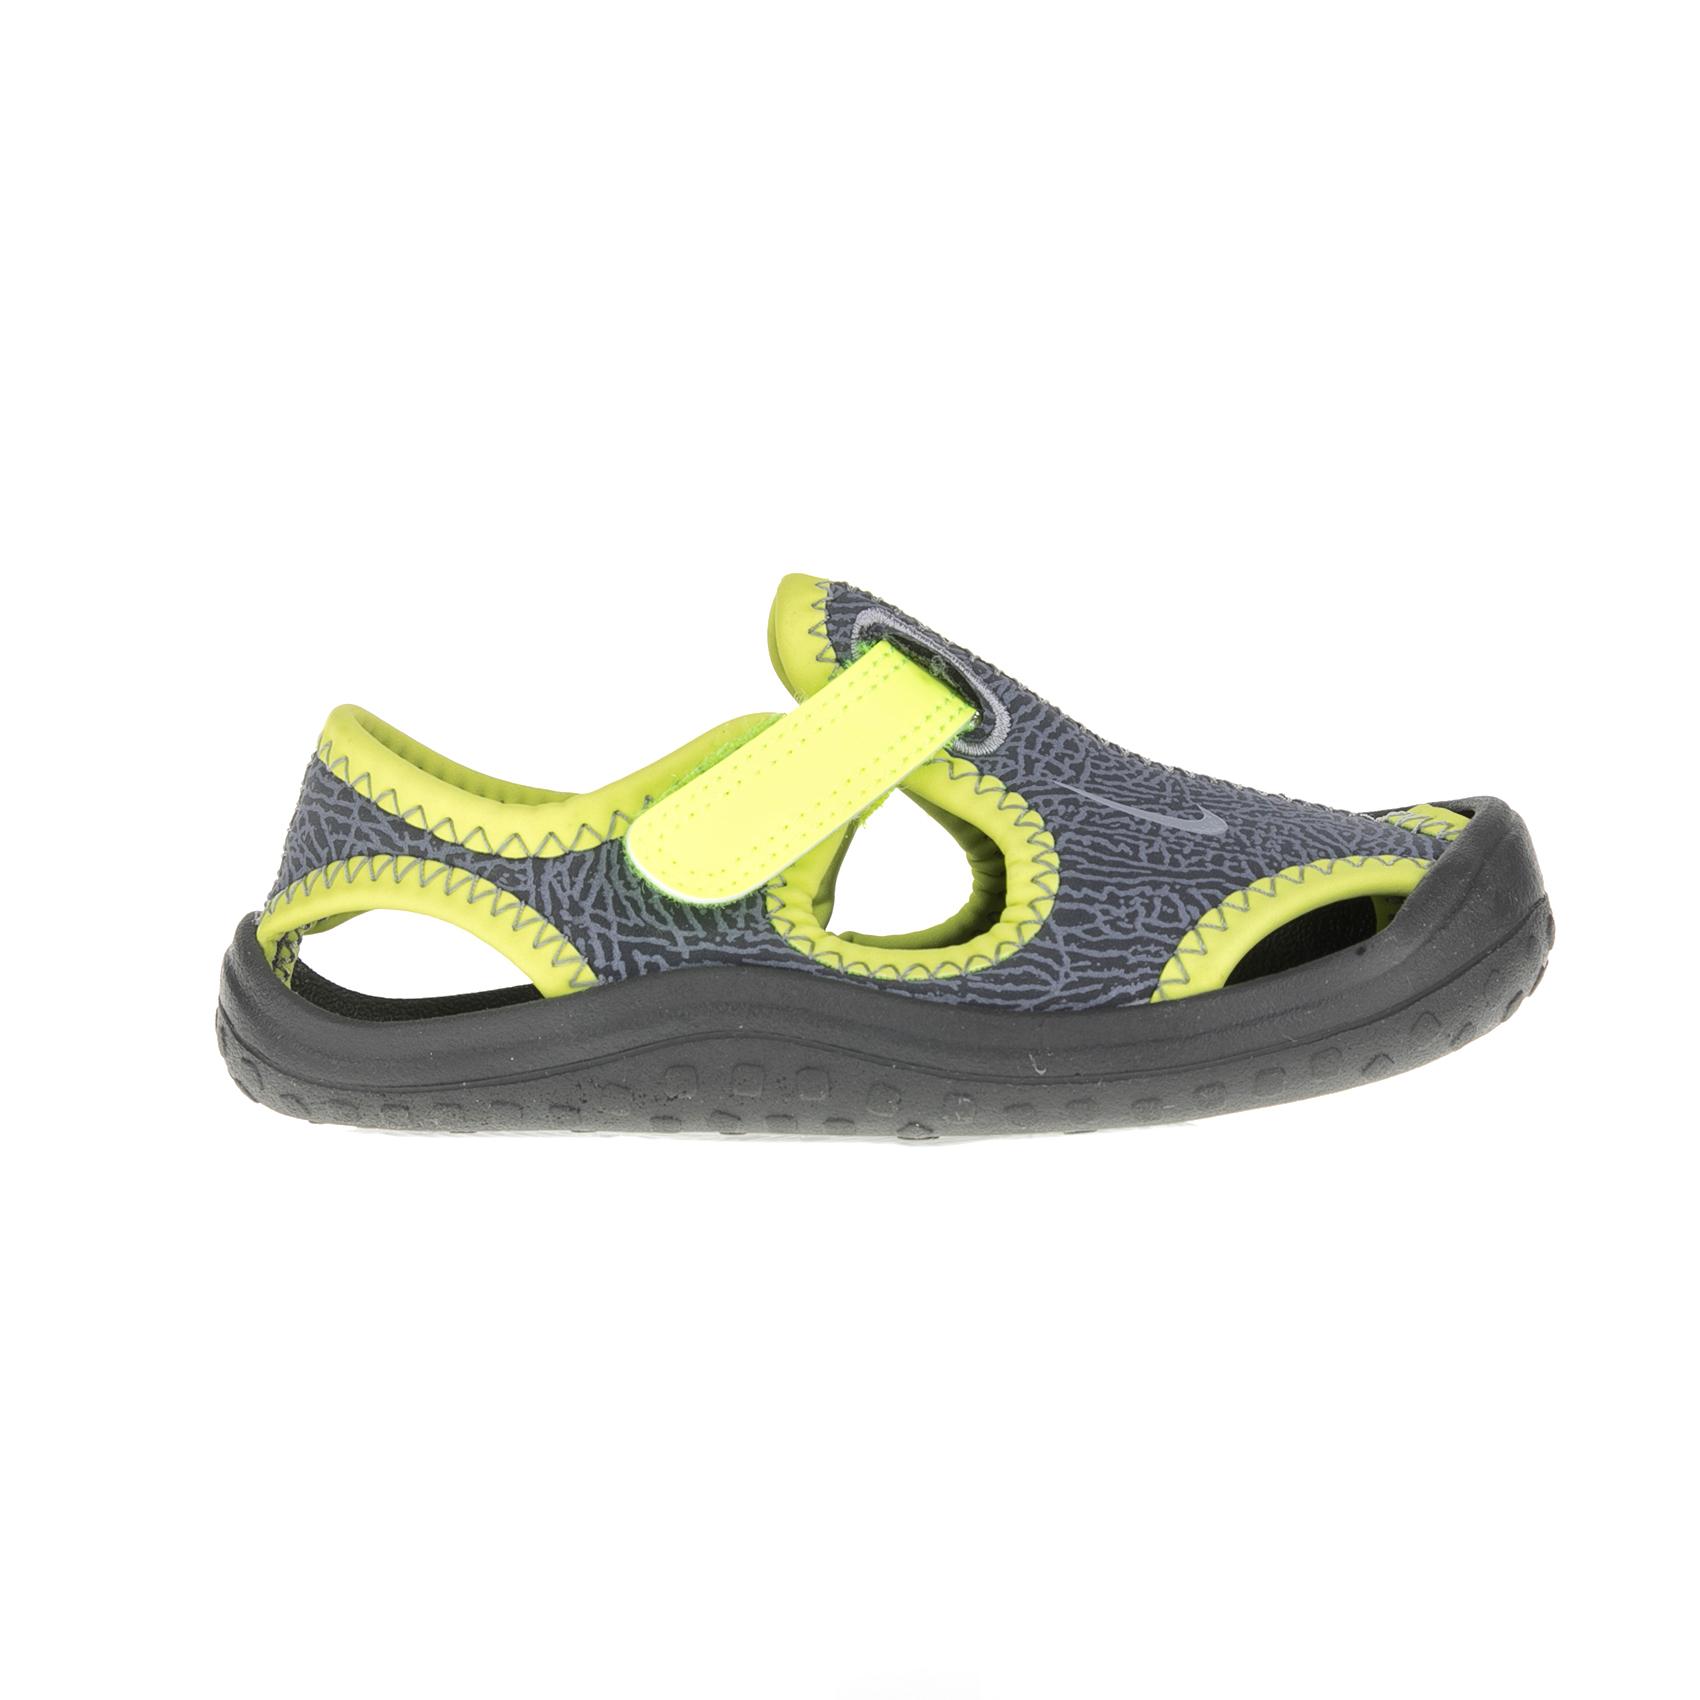 01f2cdcf1181 NIKE - Βρεφικά πέδιλα Nike SUNRAY PROTECT (TD) γκρι